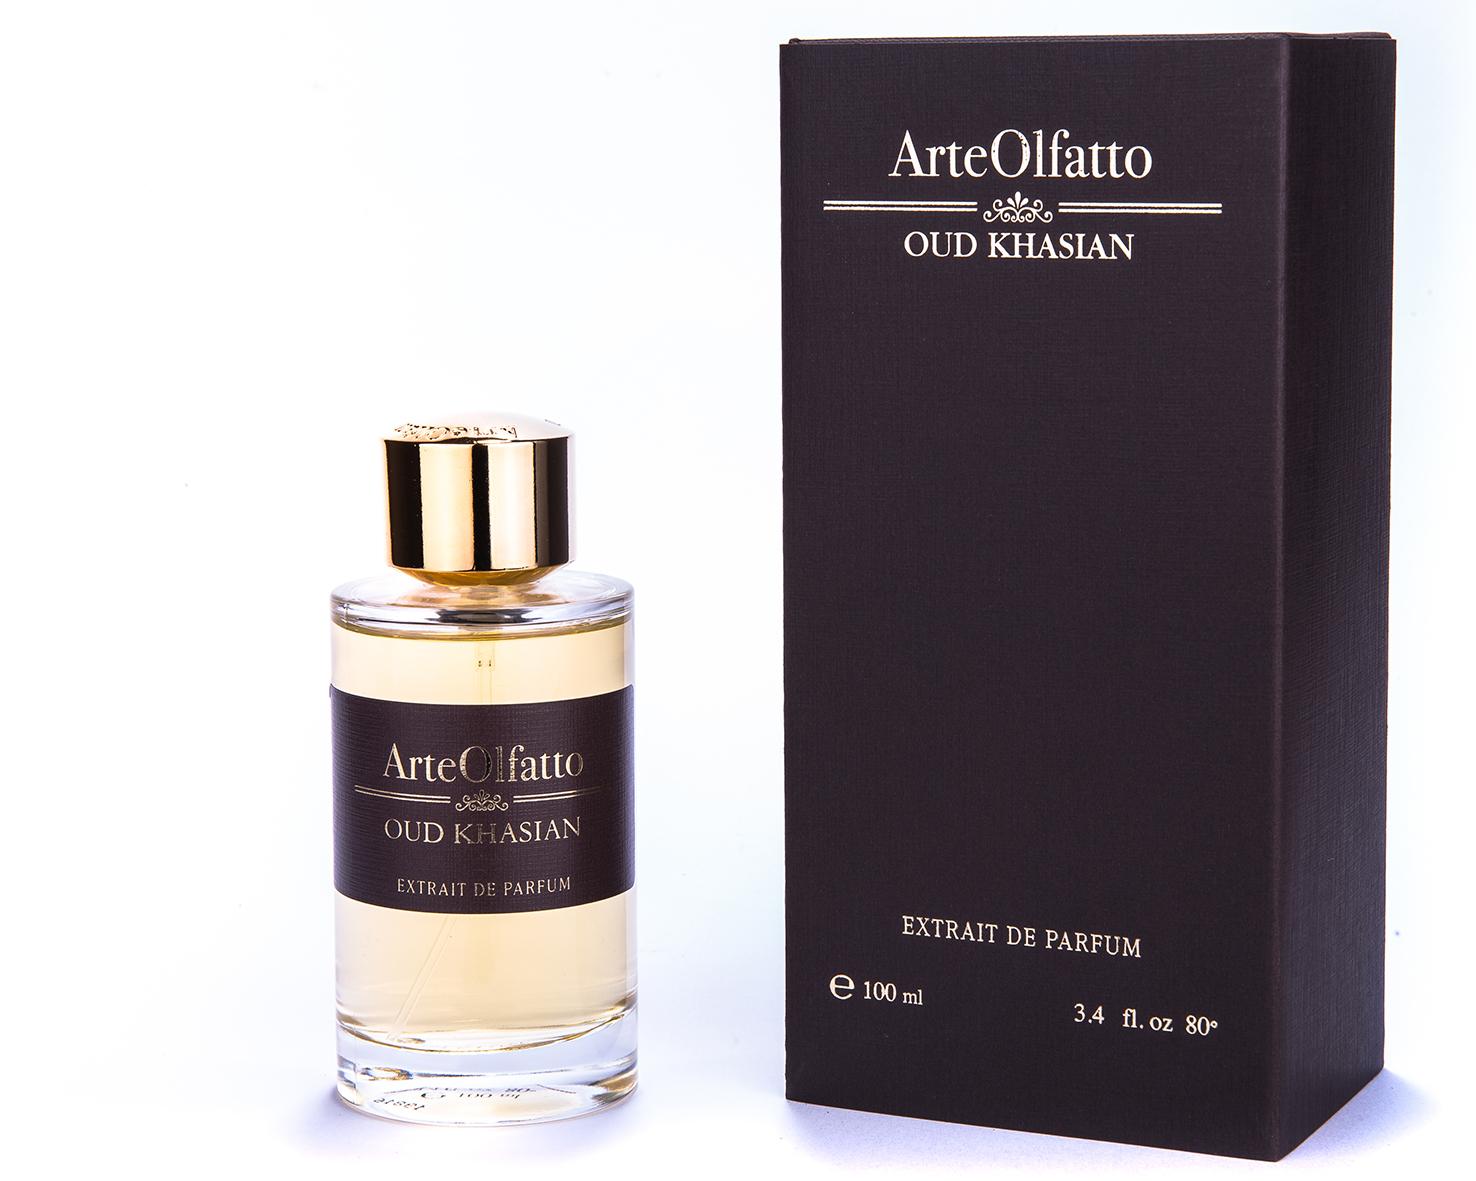 ArteOlfatto – Oud Khasian - Extrait de Parfum 100 ml